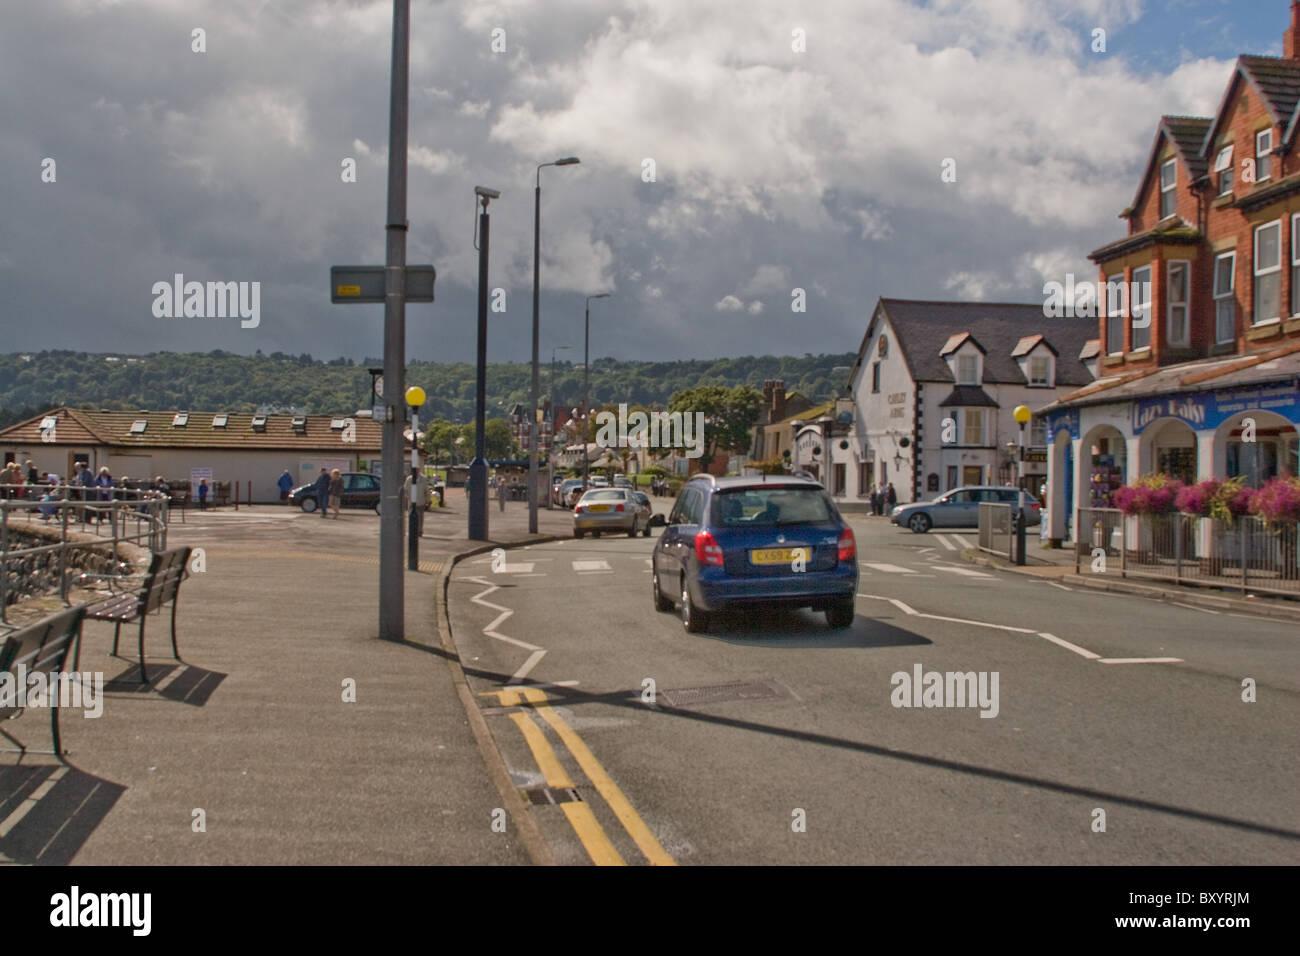 Rhos-on-Sea north Wales - Stock Image